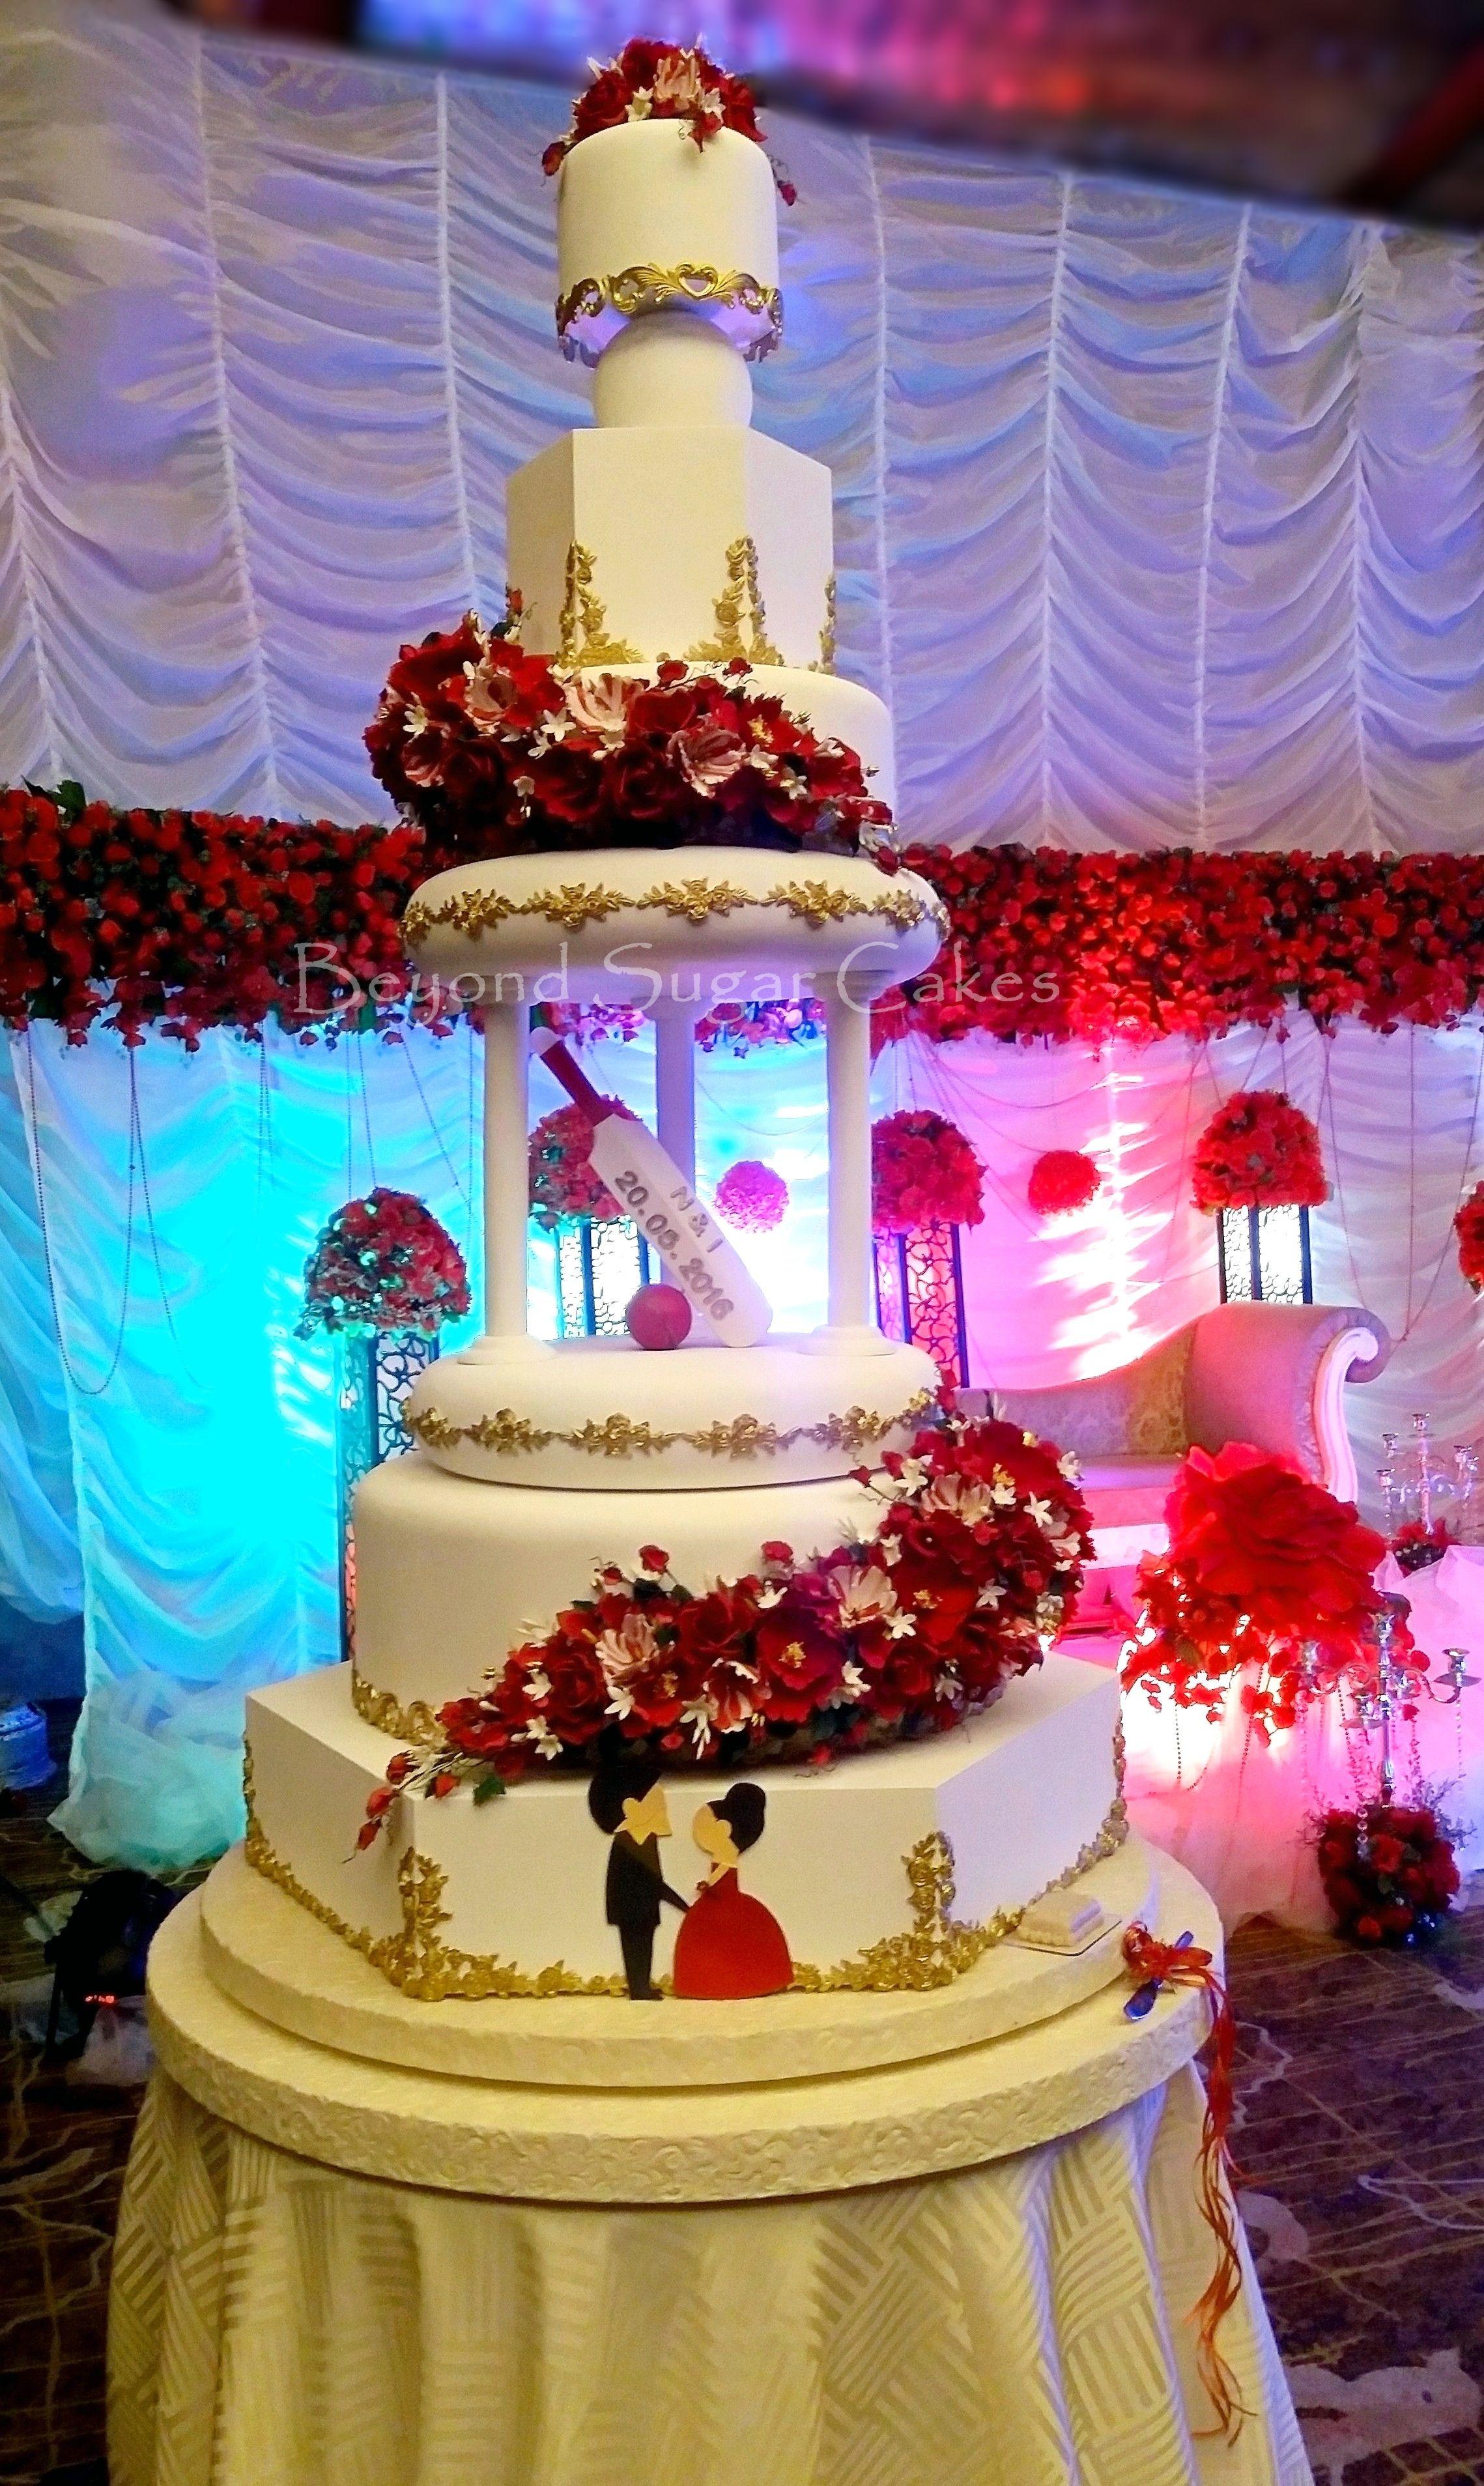 wedding cakes in lagunbeach ca%0A Huge Wedding Cakes  Sugar Cake  Amazing Cakes  Bakeries  Sugaring   Desserts  Tailgate Desserts  Deserts  Dessert